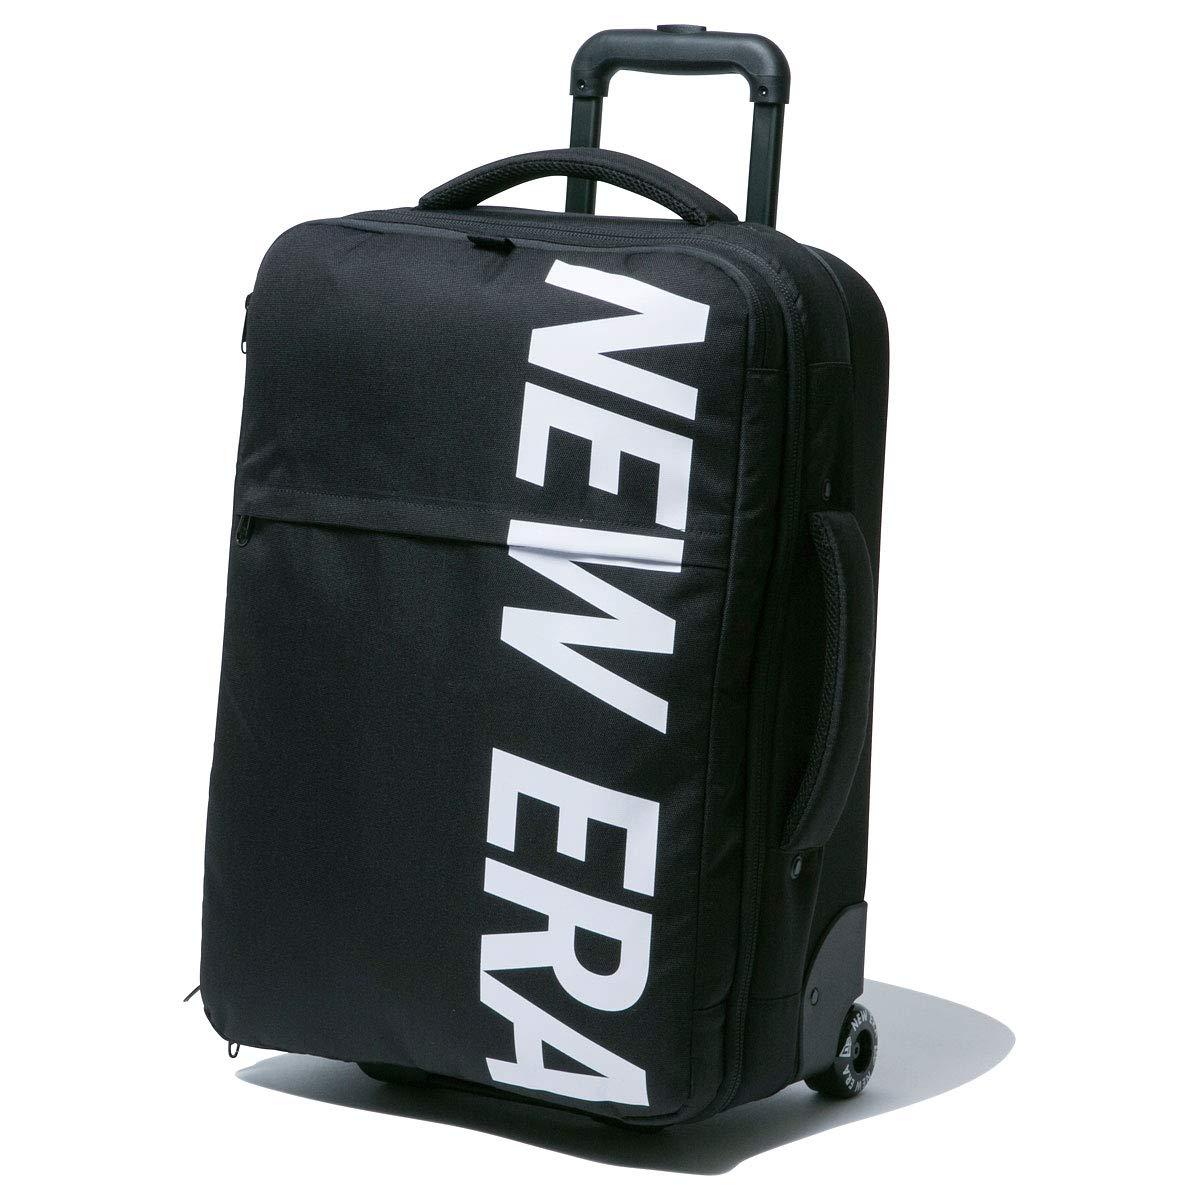 New Era ニューエラ バッグ キャリーバッグ ホイールバッグ ブラック ホワイト 11404105 One Size ブラック B07NFFMRTP